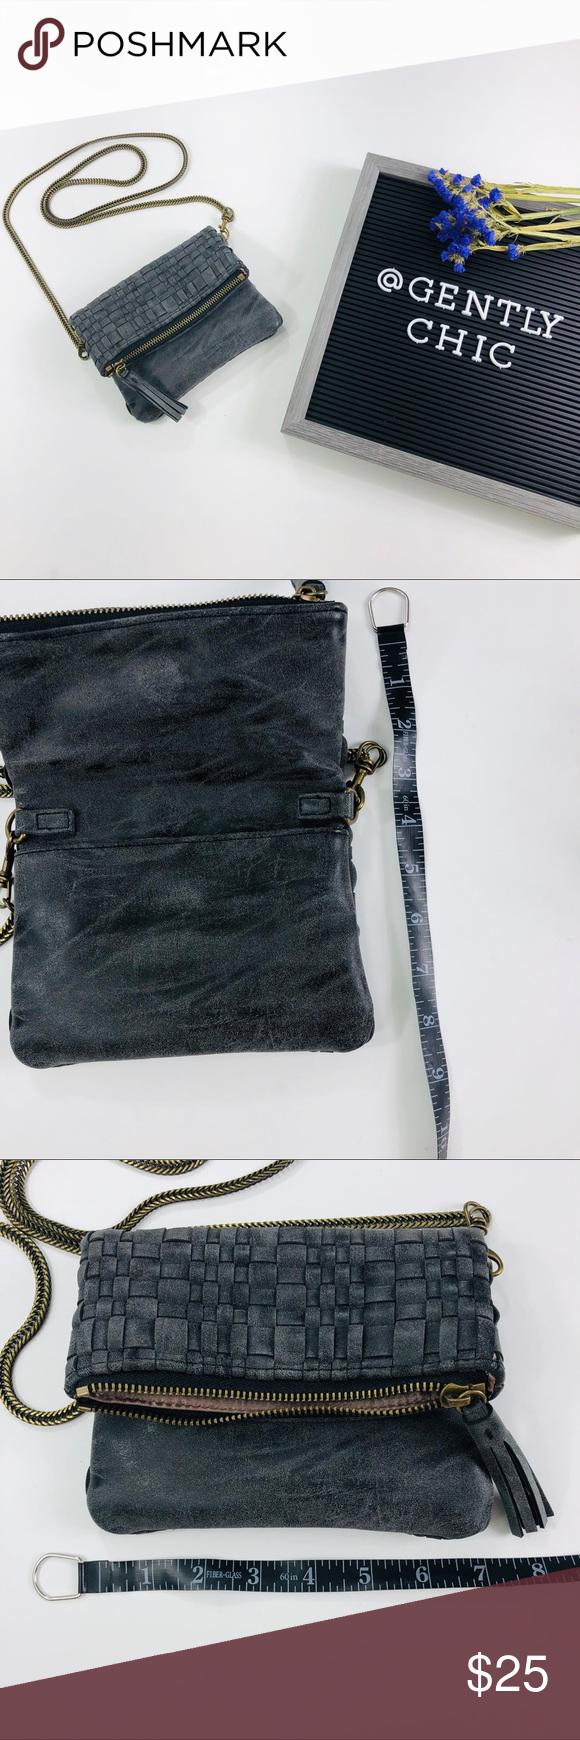 9b1e48f96d6f Deux Lux • Gray Basketweave Mini Crossbody Bag Deux Lux Gray basketweave Small  crossbody bag.